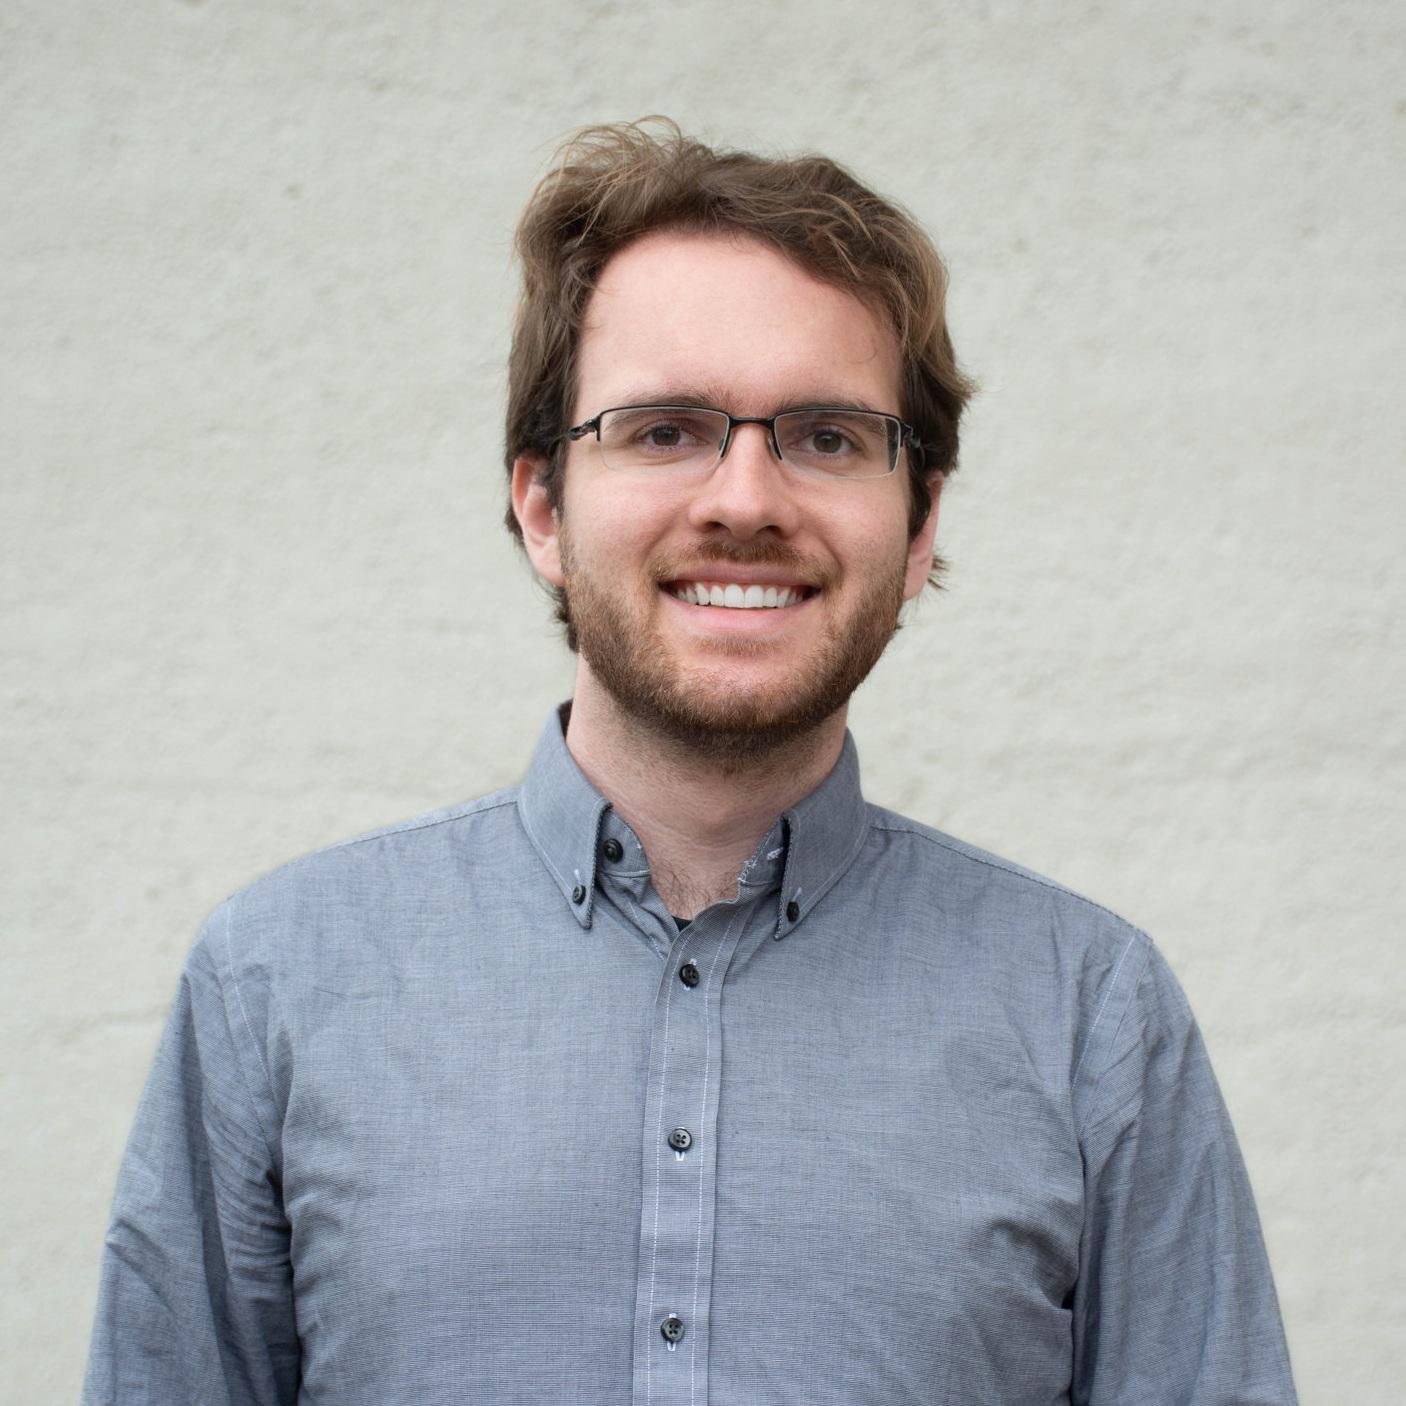 Jonathan Delaney